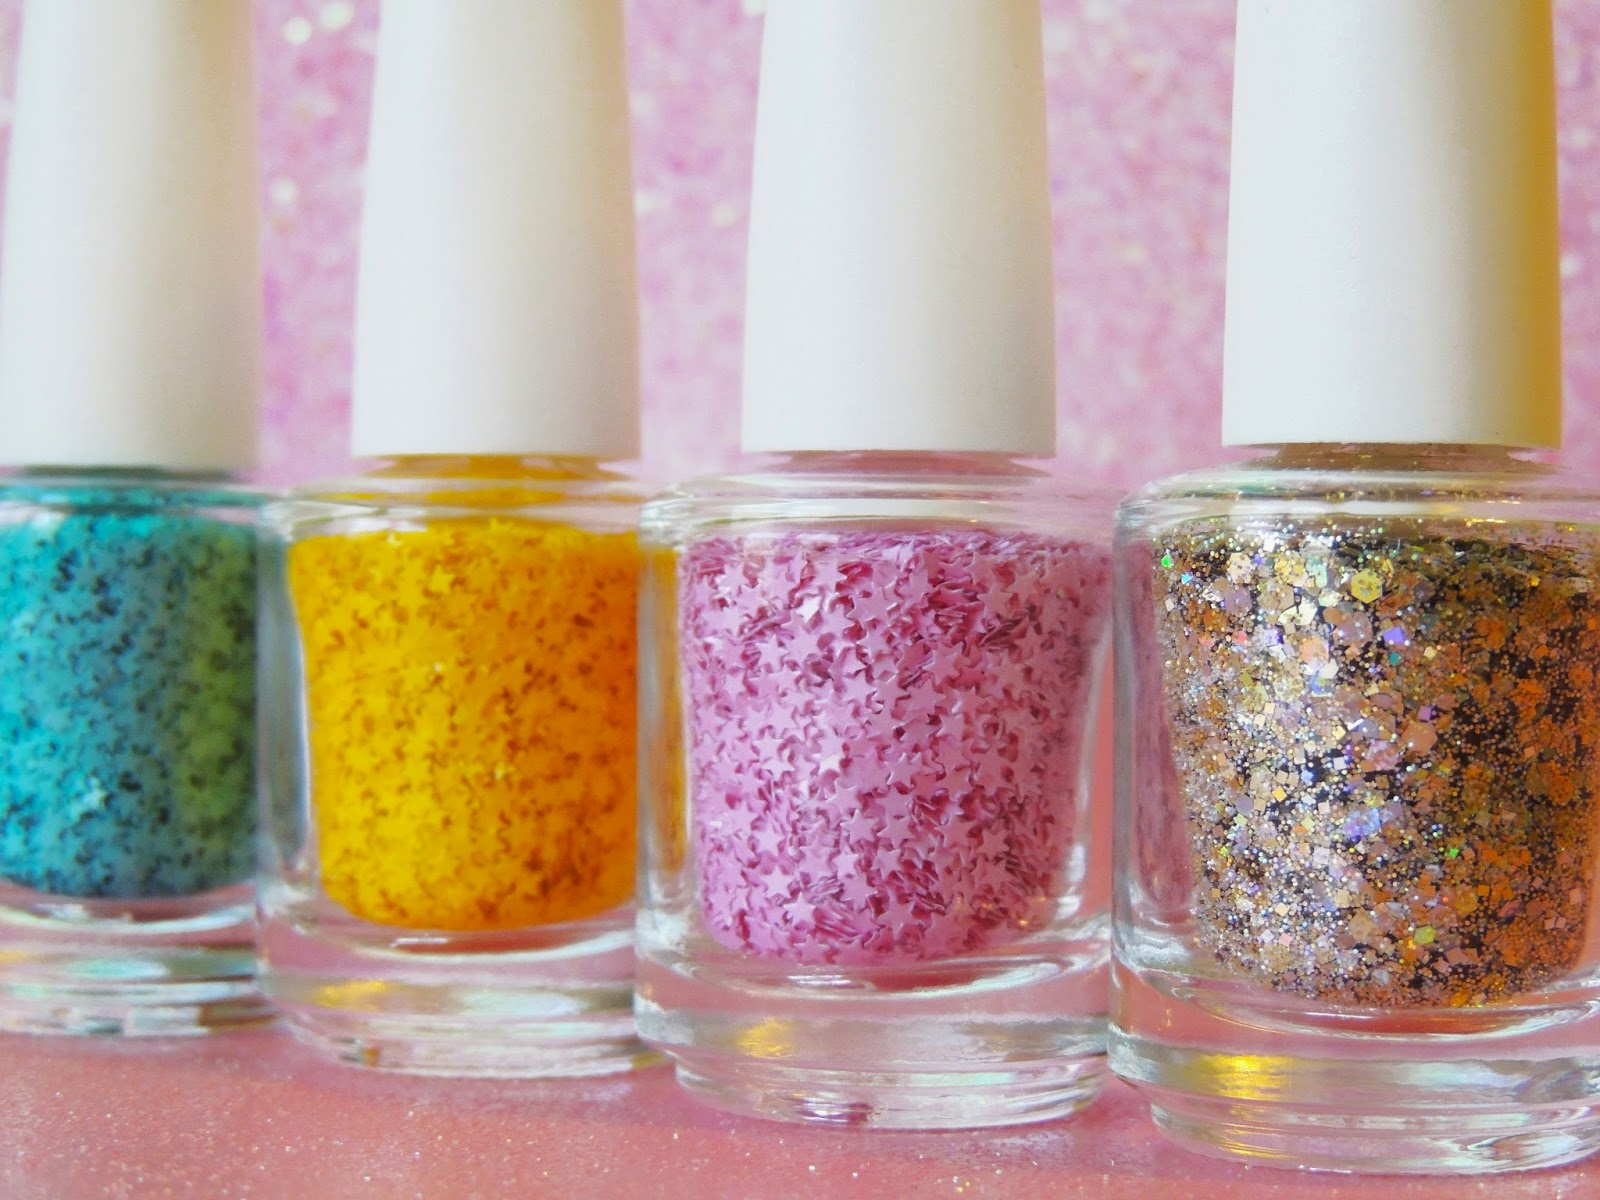 Raw Glitter Mix for doing Nail Art! By Glitter Lambs